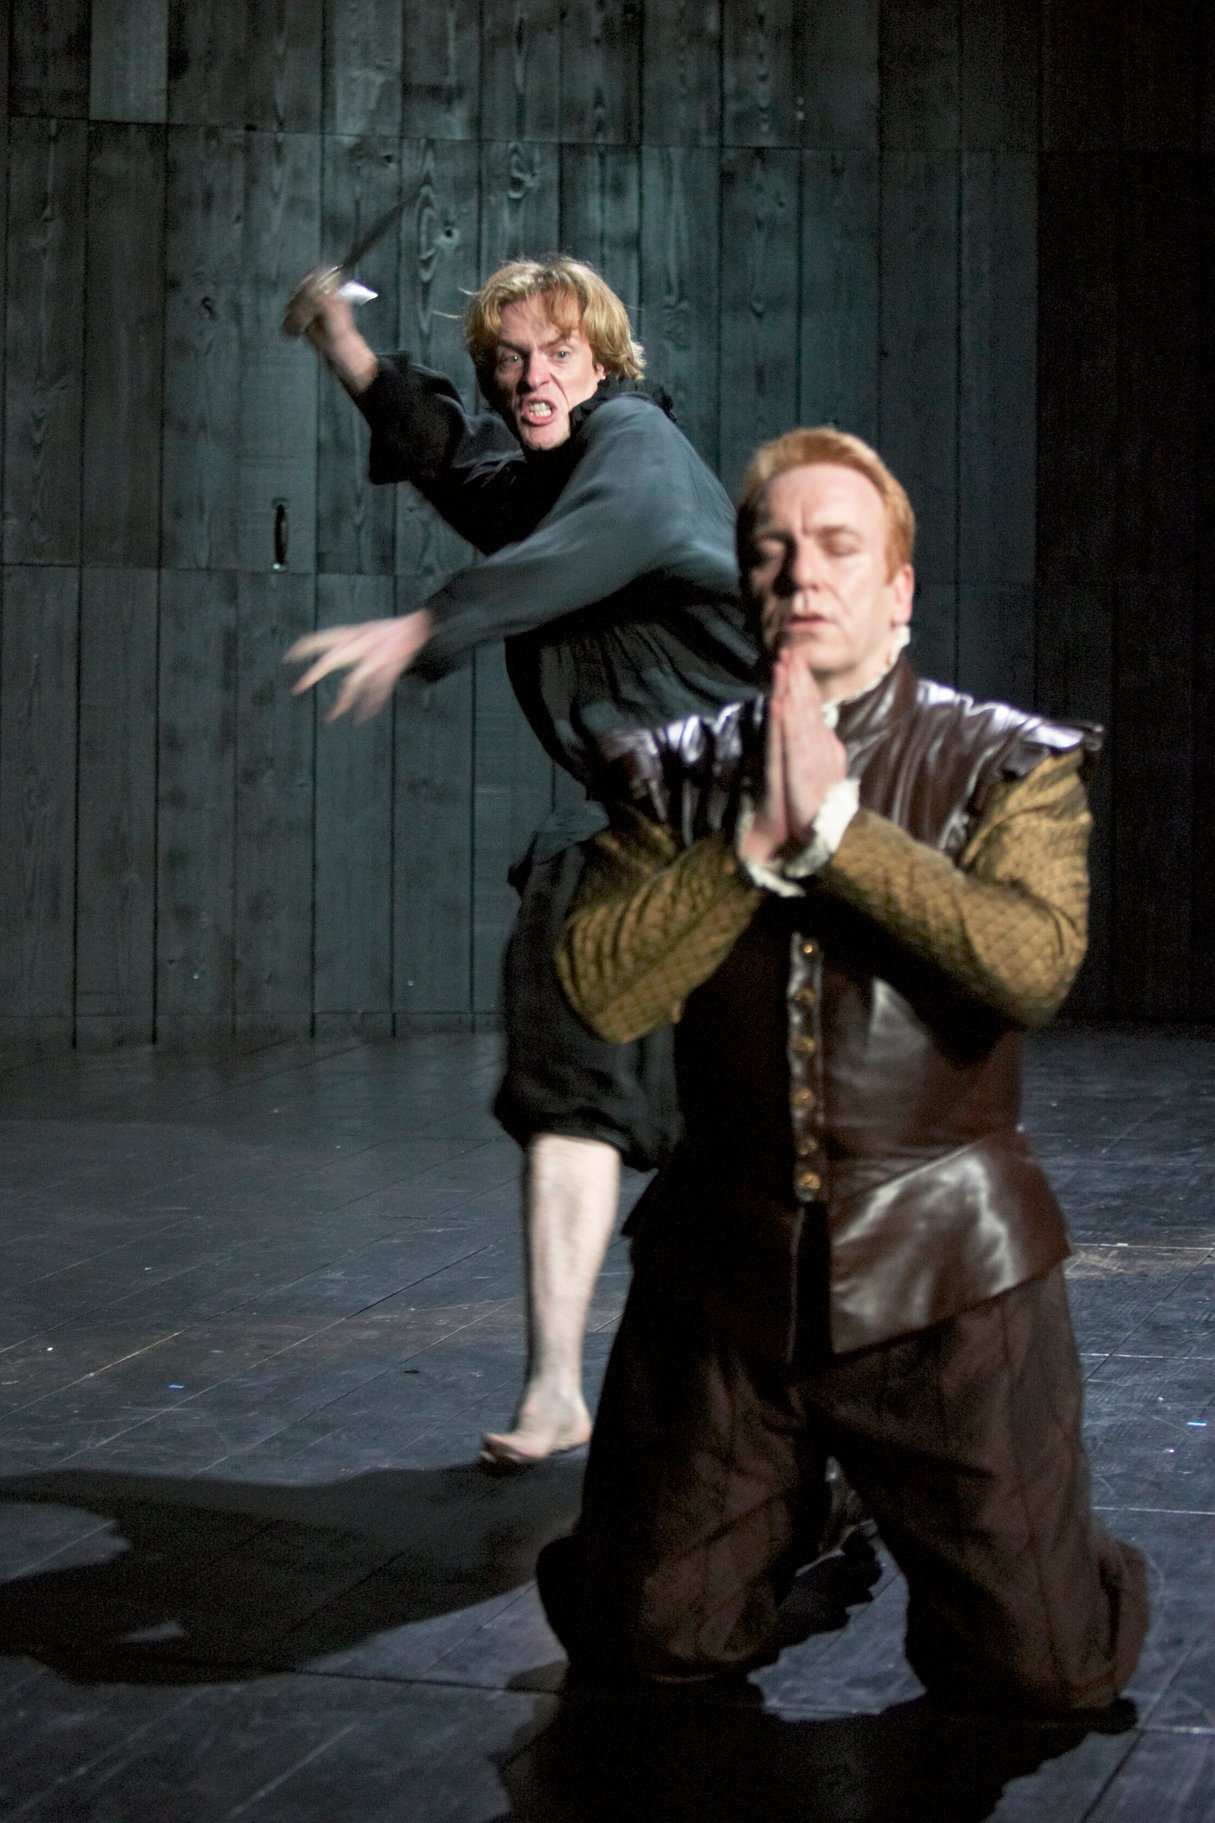 Hamlet prepares to strike at the praying Claudius